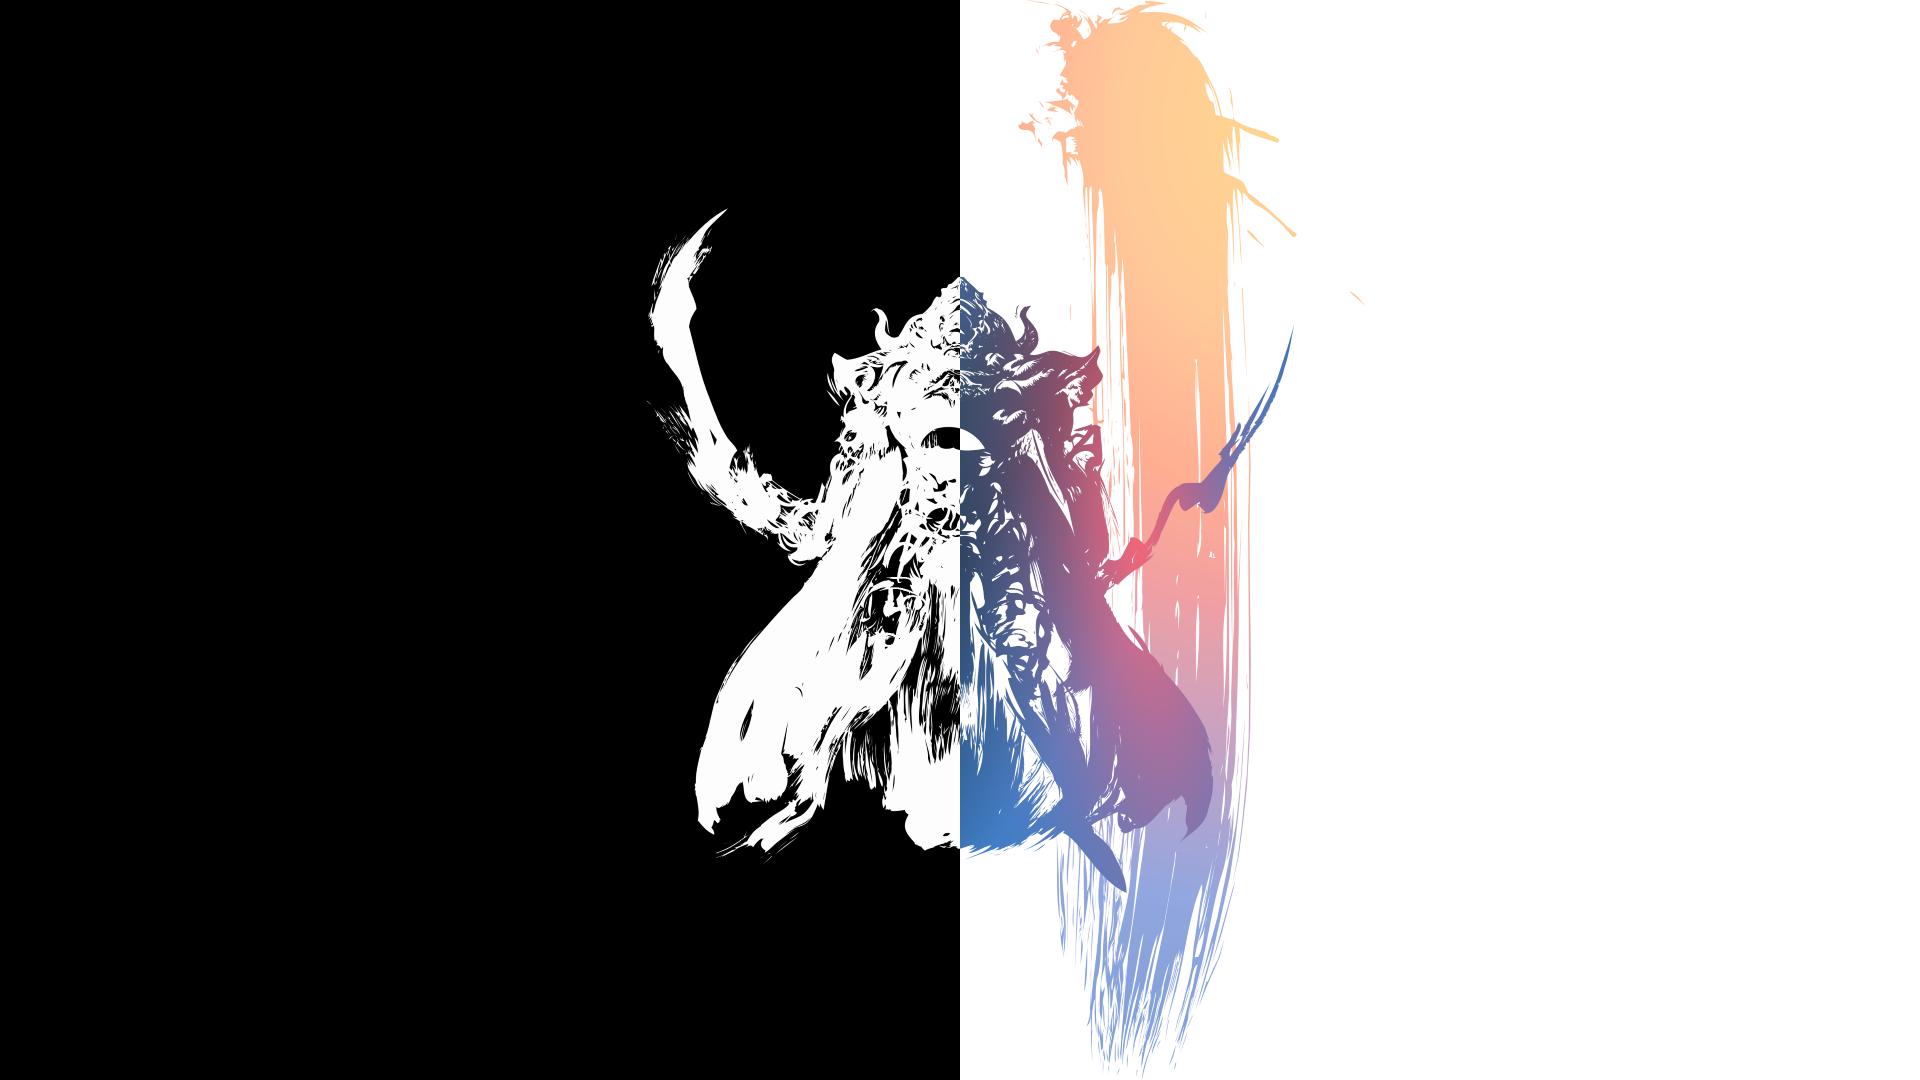 Final Fantasy Xii Logo Wallpaper By Erap320 On Deviantart